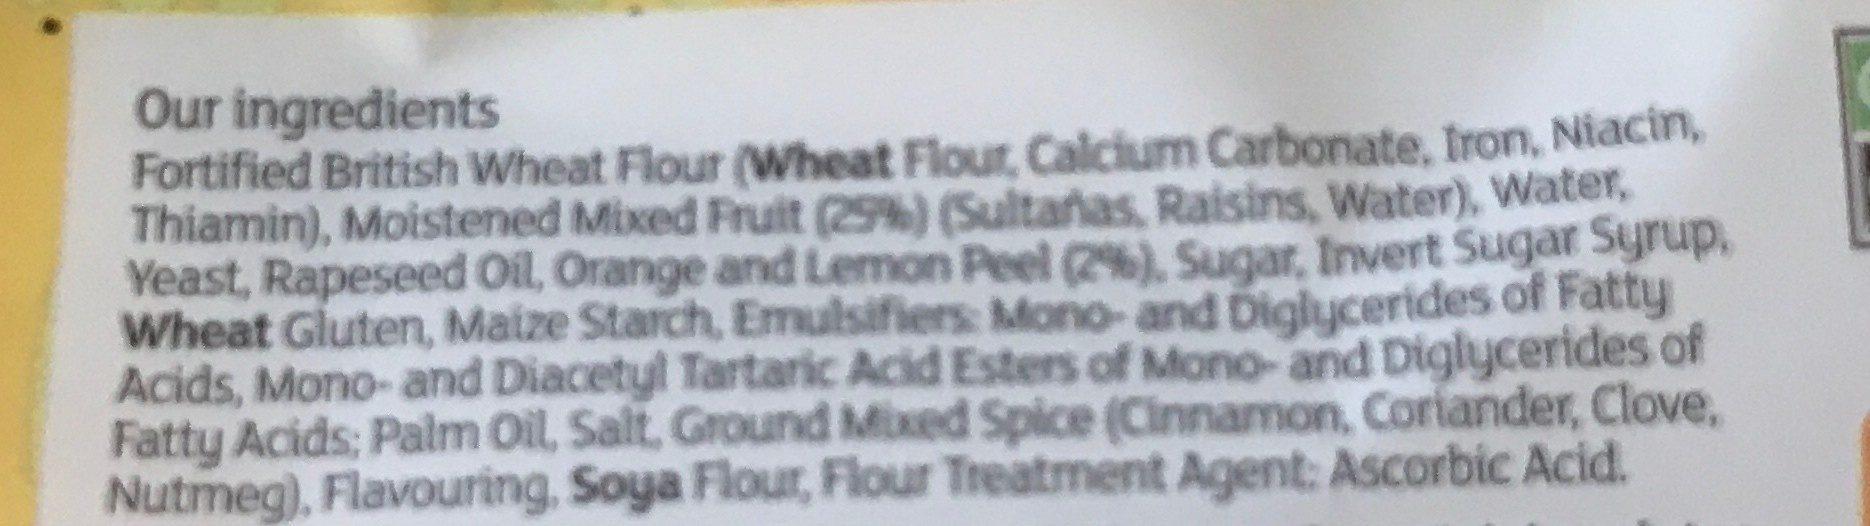 Hot cross buns - Ingrediënten - en